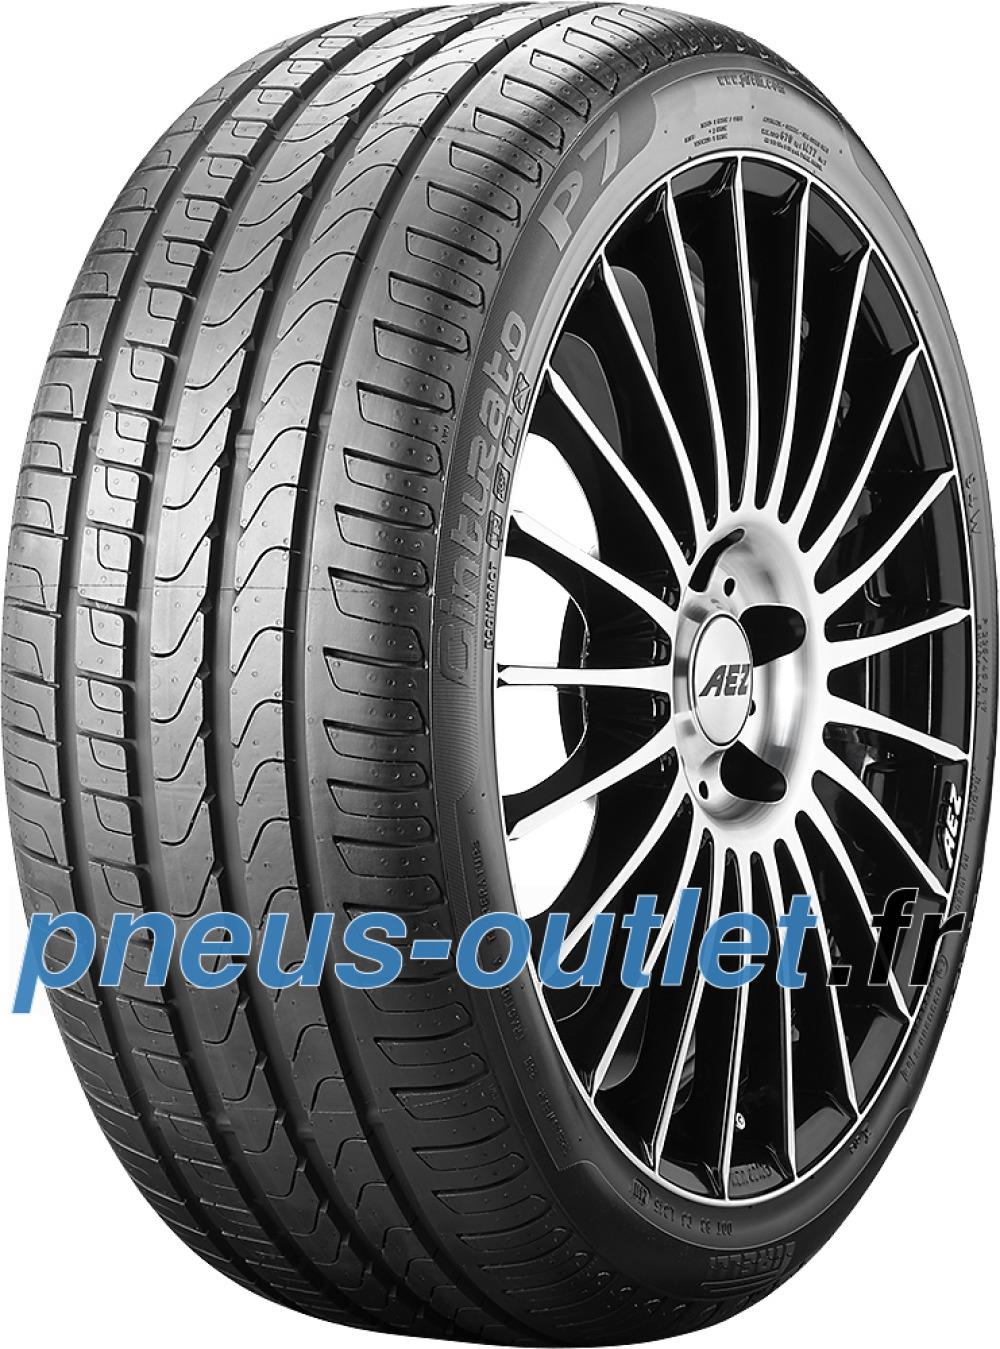 Pirelli Cinturato P7 ( 245/45 R17 99Y XL MO, ECOIMPACT, avec protège-jante (MFS) )